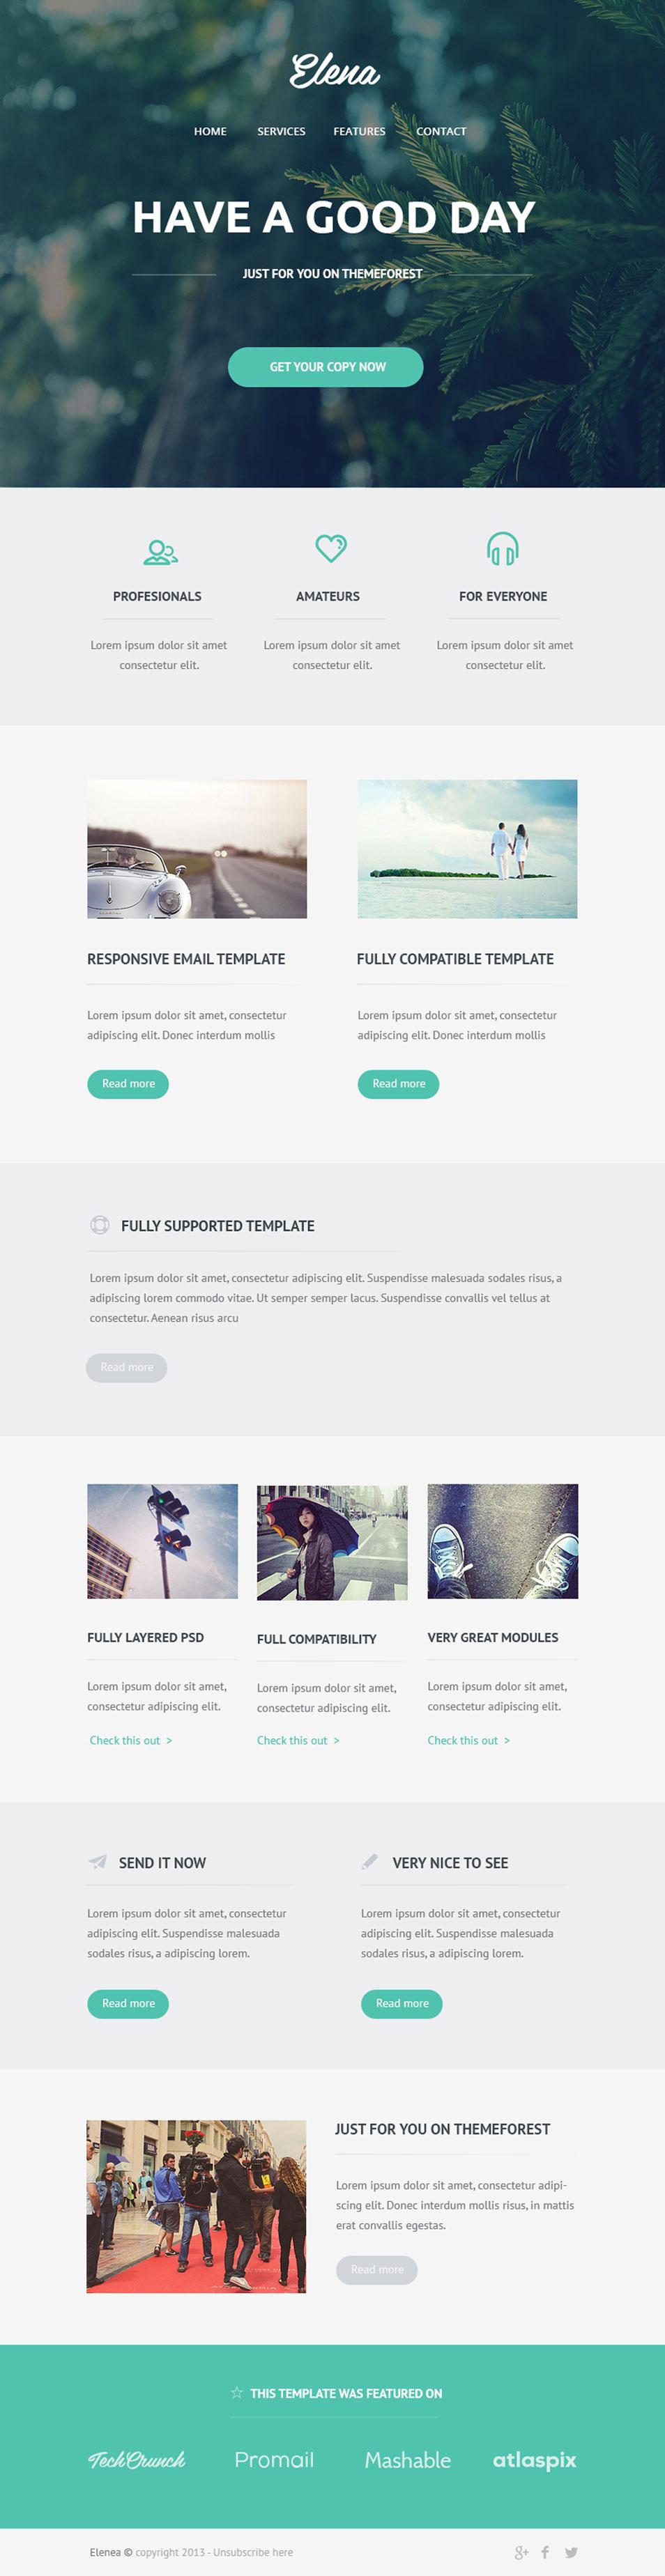 100+ Latest Free Web Page Templates PSD | Graphic Design | Pinterest ...